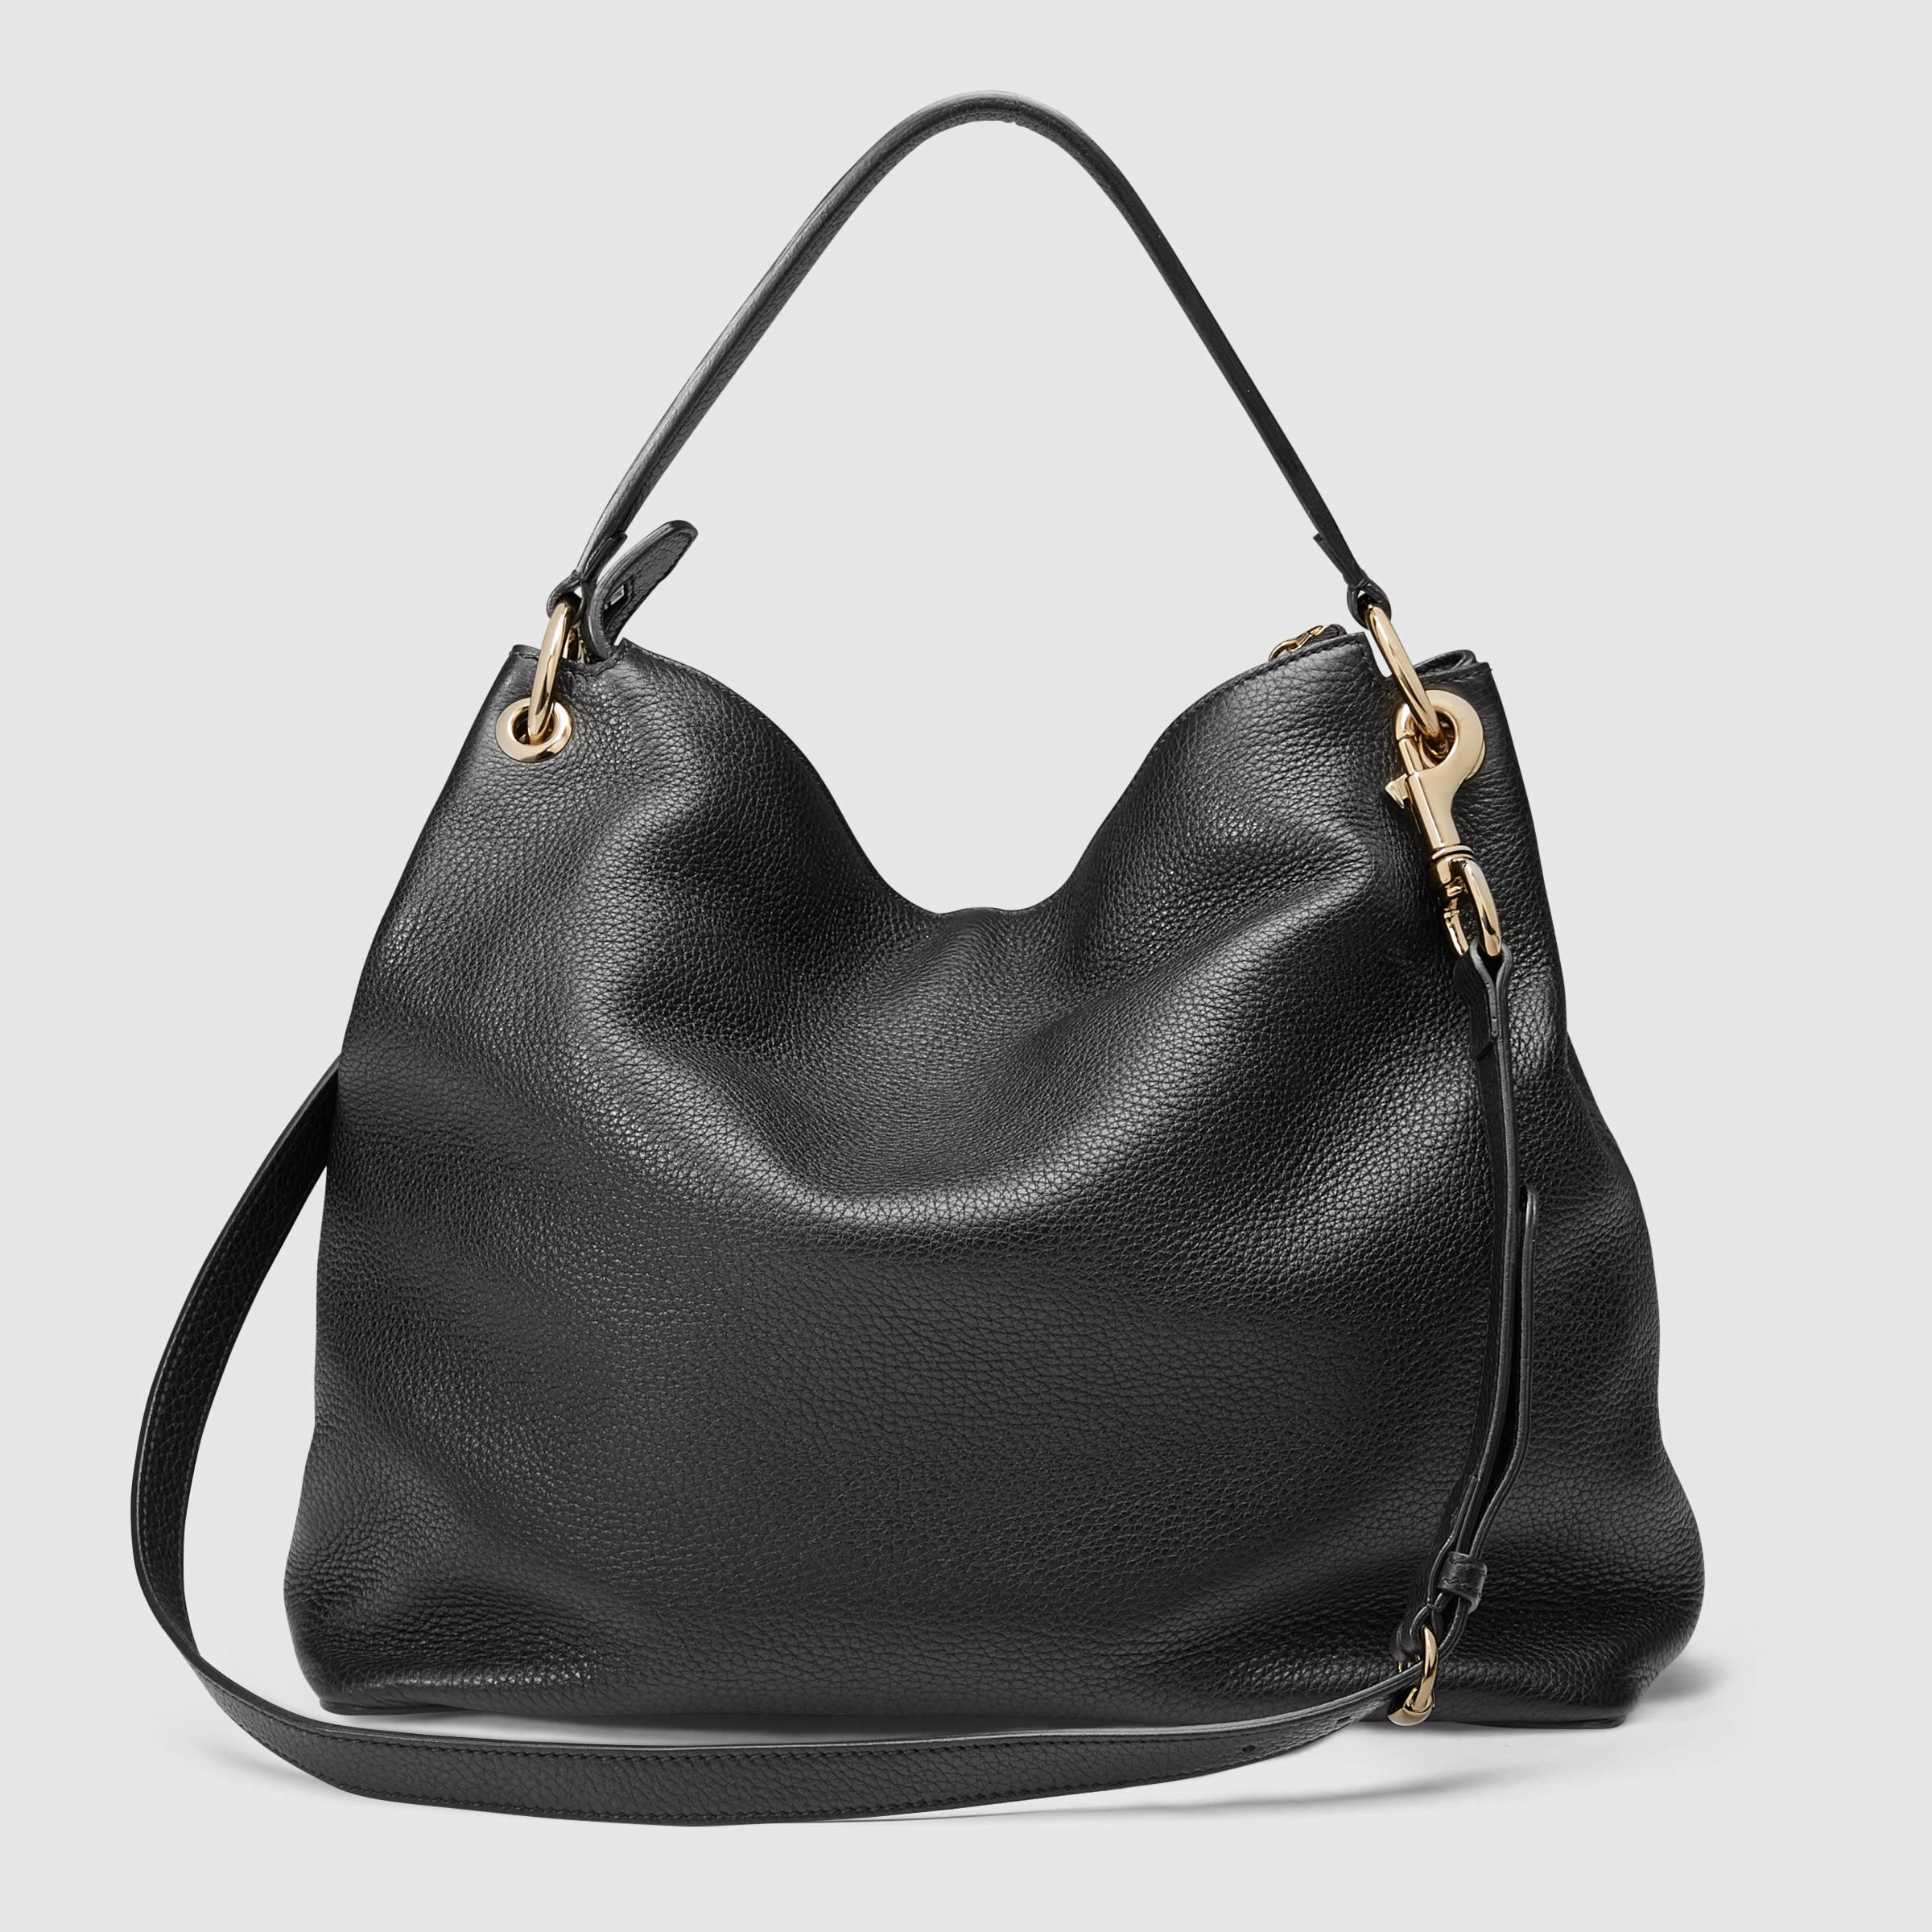 Gucci Soho Leather Hobo in Black